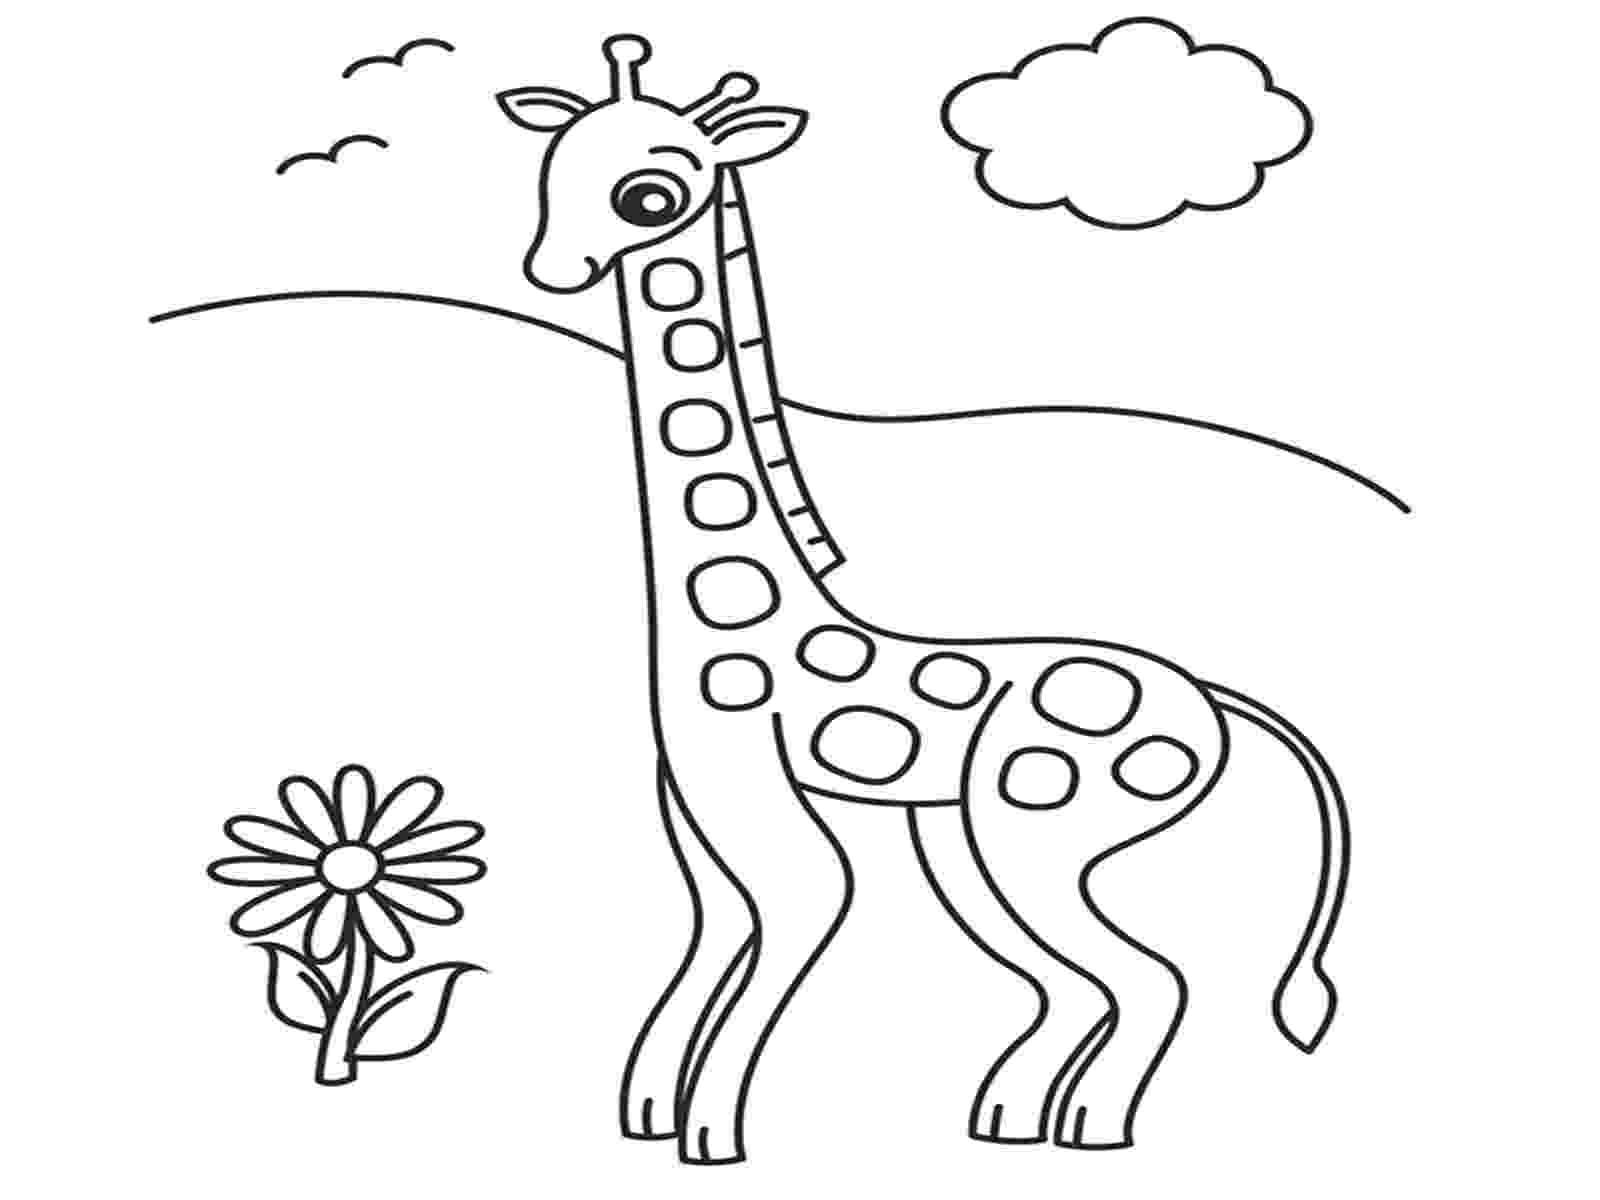 giraffe coloring pages giraffe coloring pages coloring pages to print coloring giraffe pages